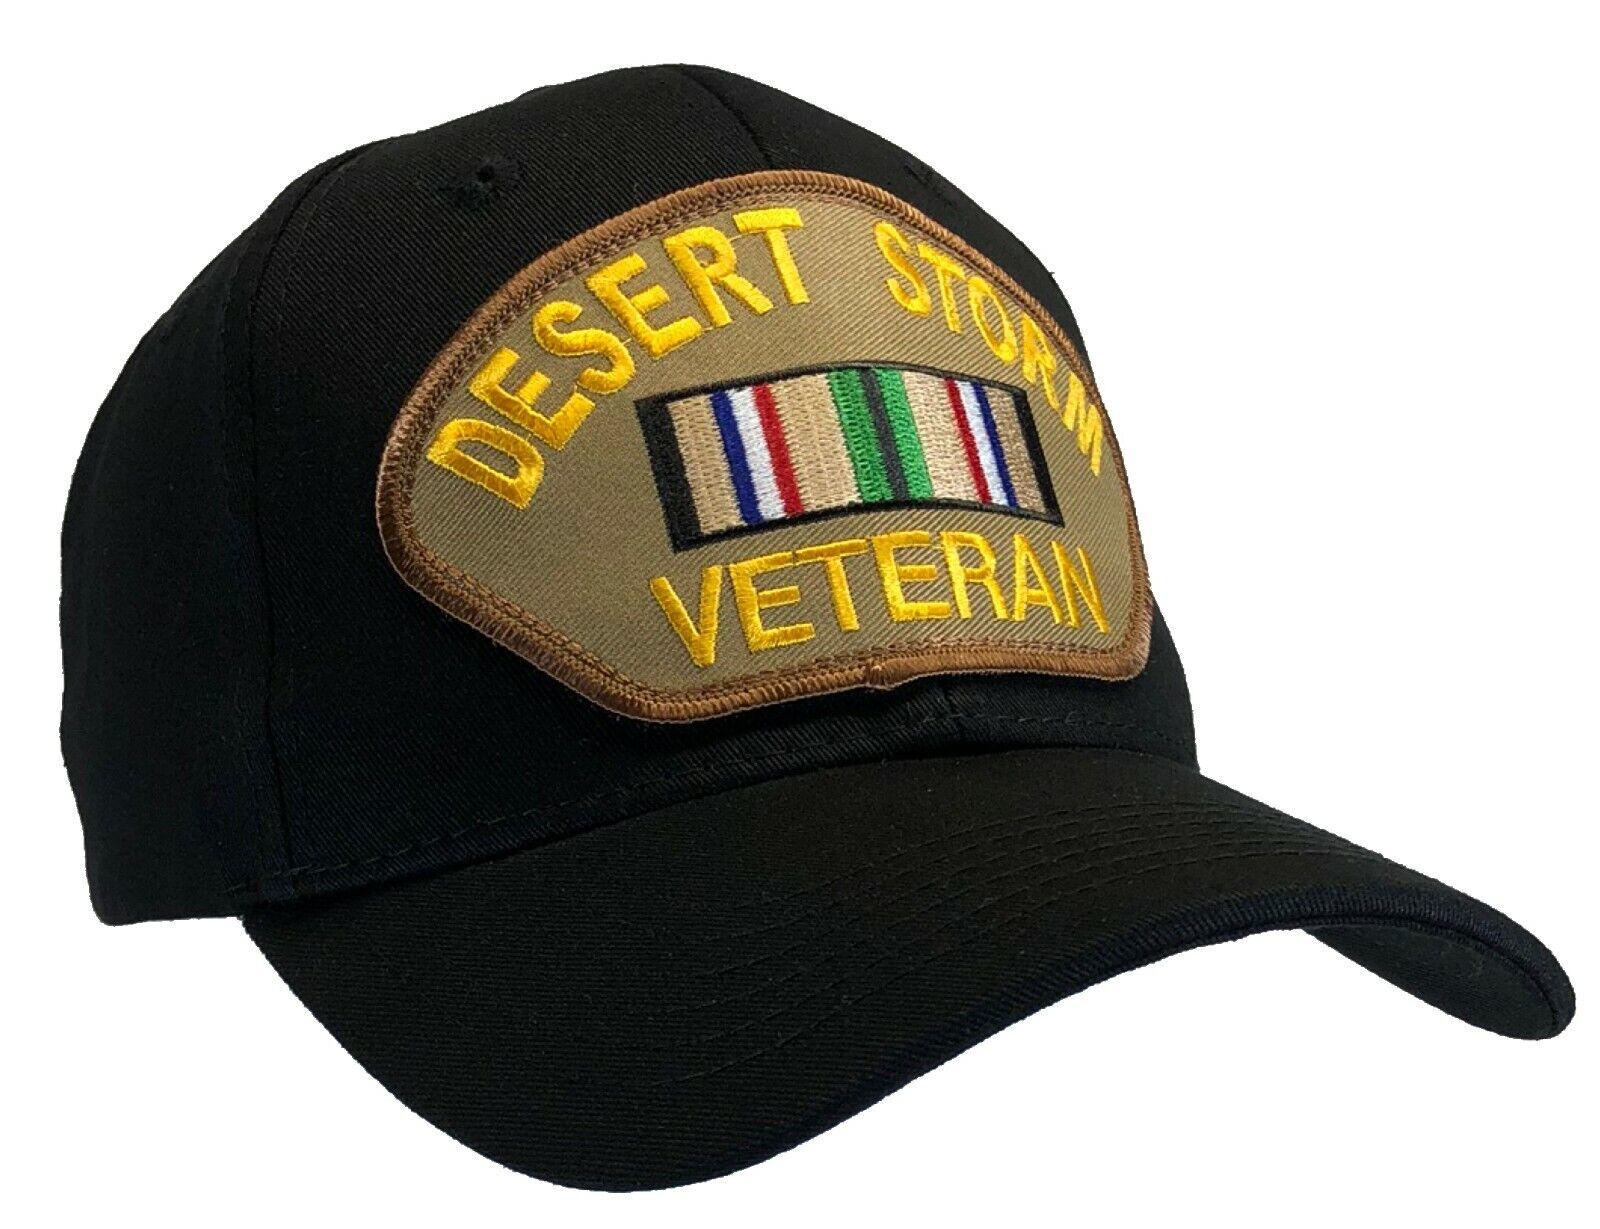 Desert Storm Veteran Hat Black Baseball Cap